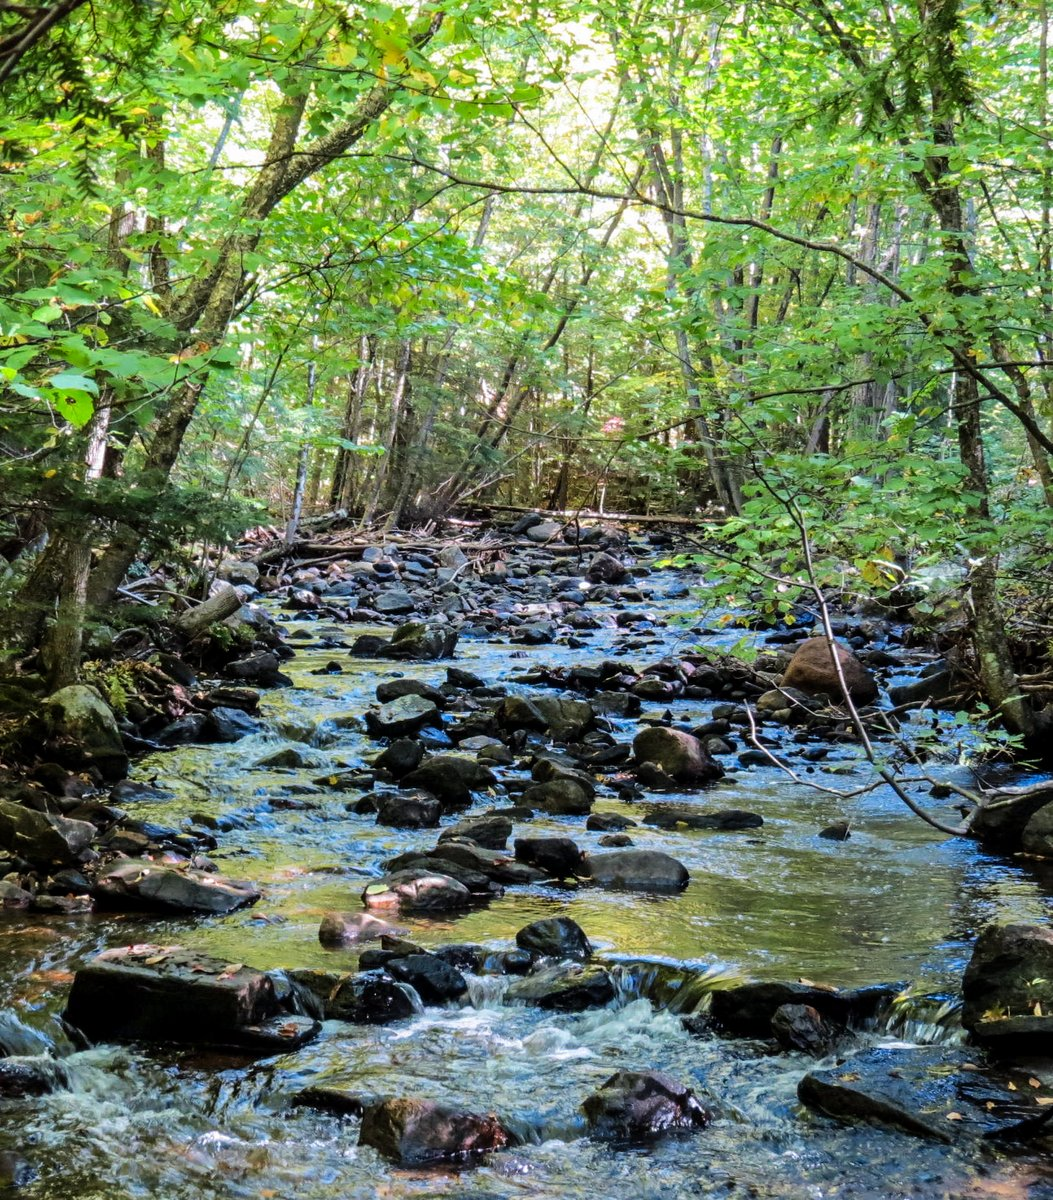 4. Beaver Brook